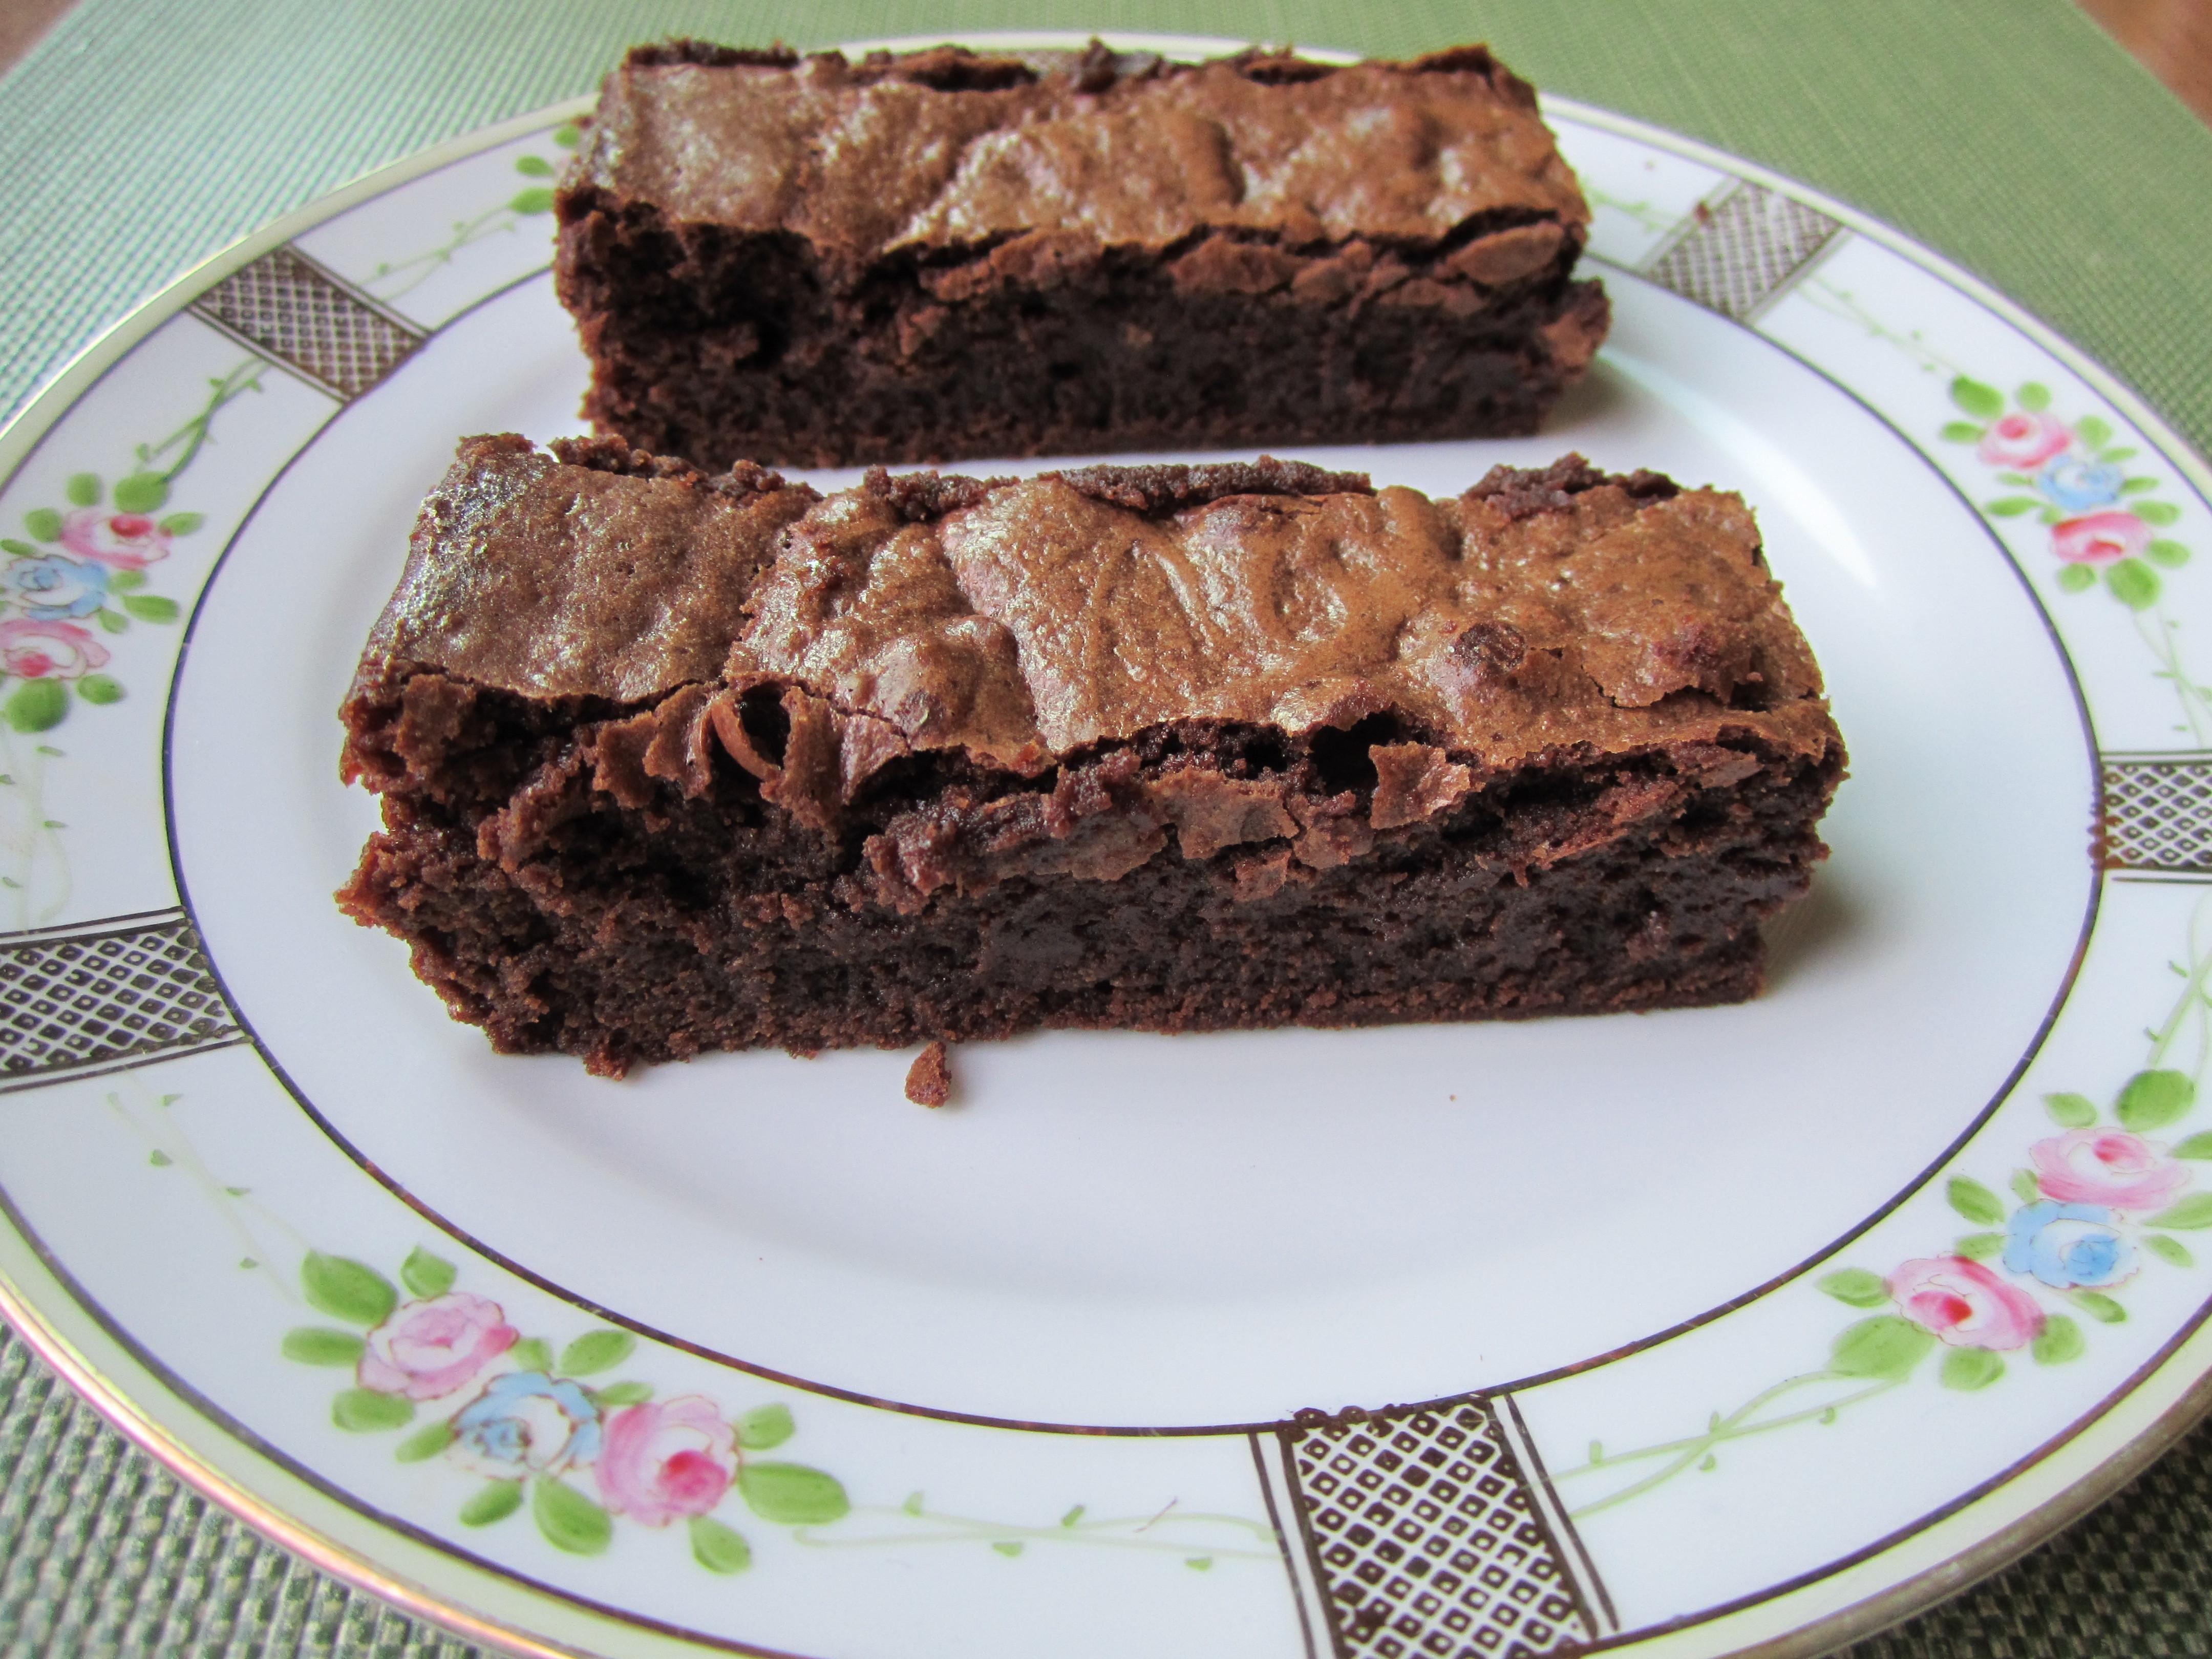 Cake Like Brownies  cake like brownies from scratch